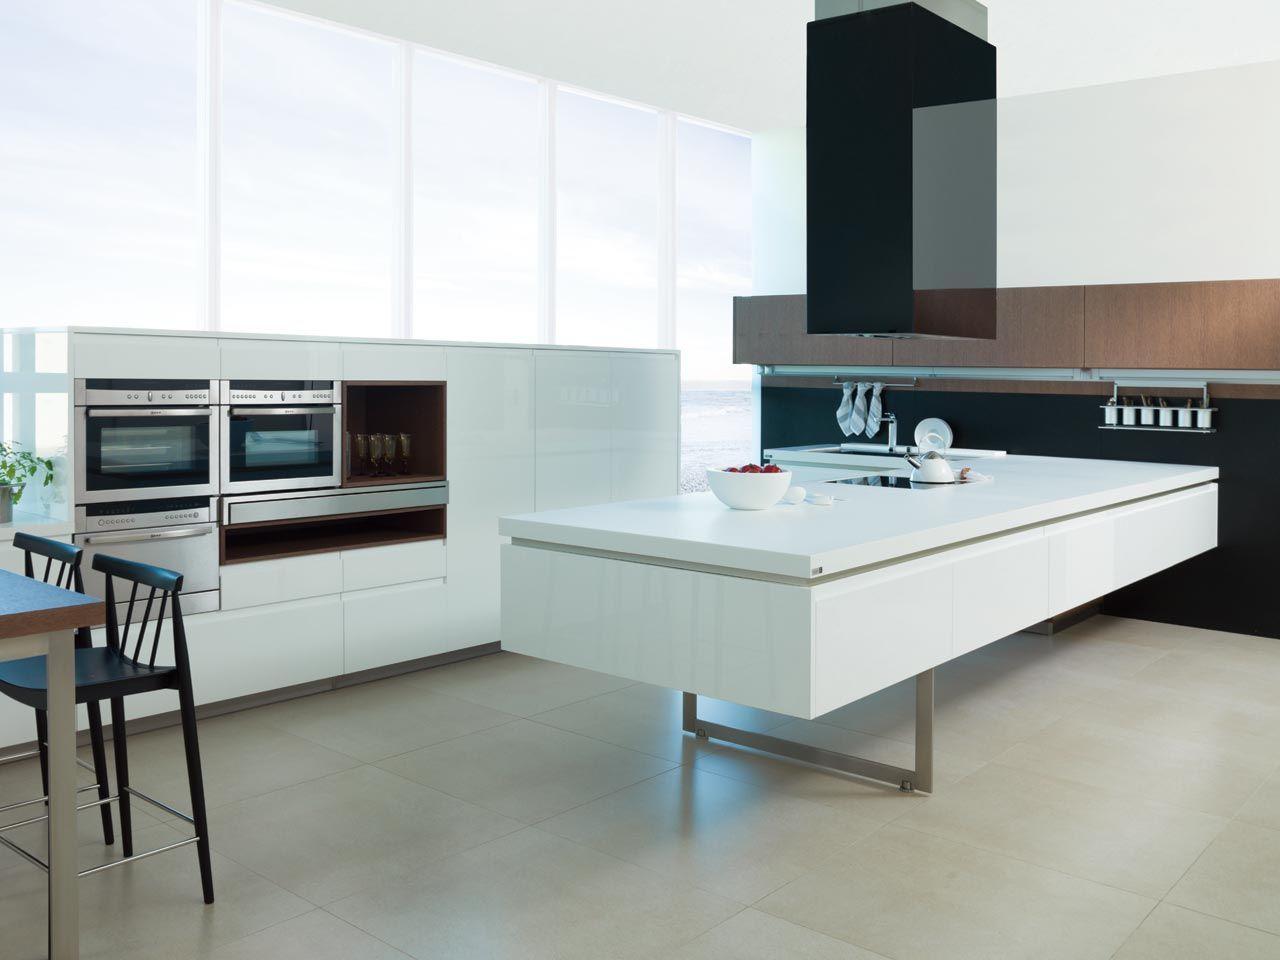 Porcelanosa Pisos Y M S De Quer Taro House Pinterest  # Muebles Queretaro